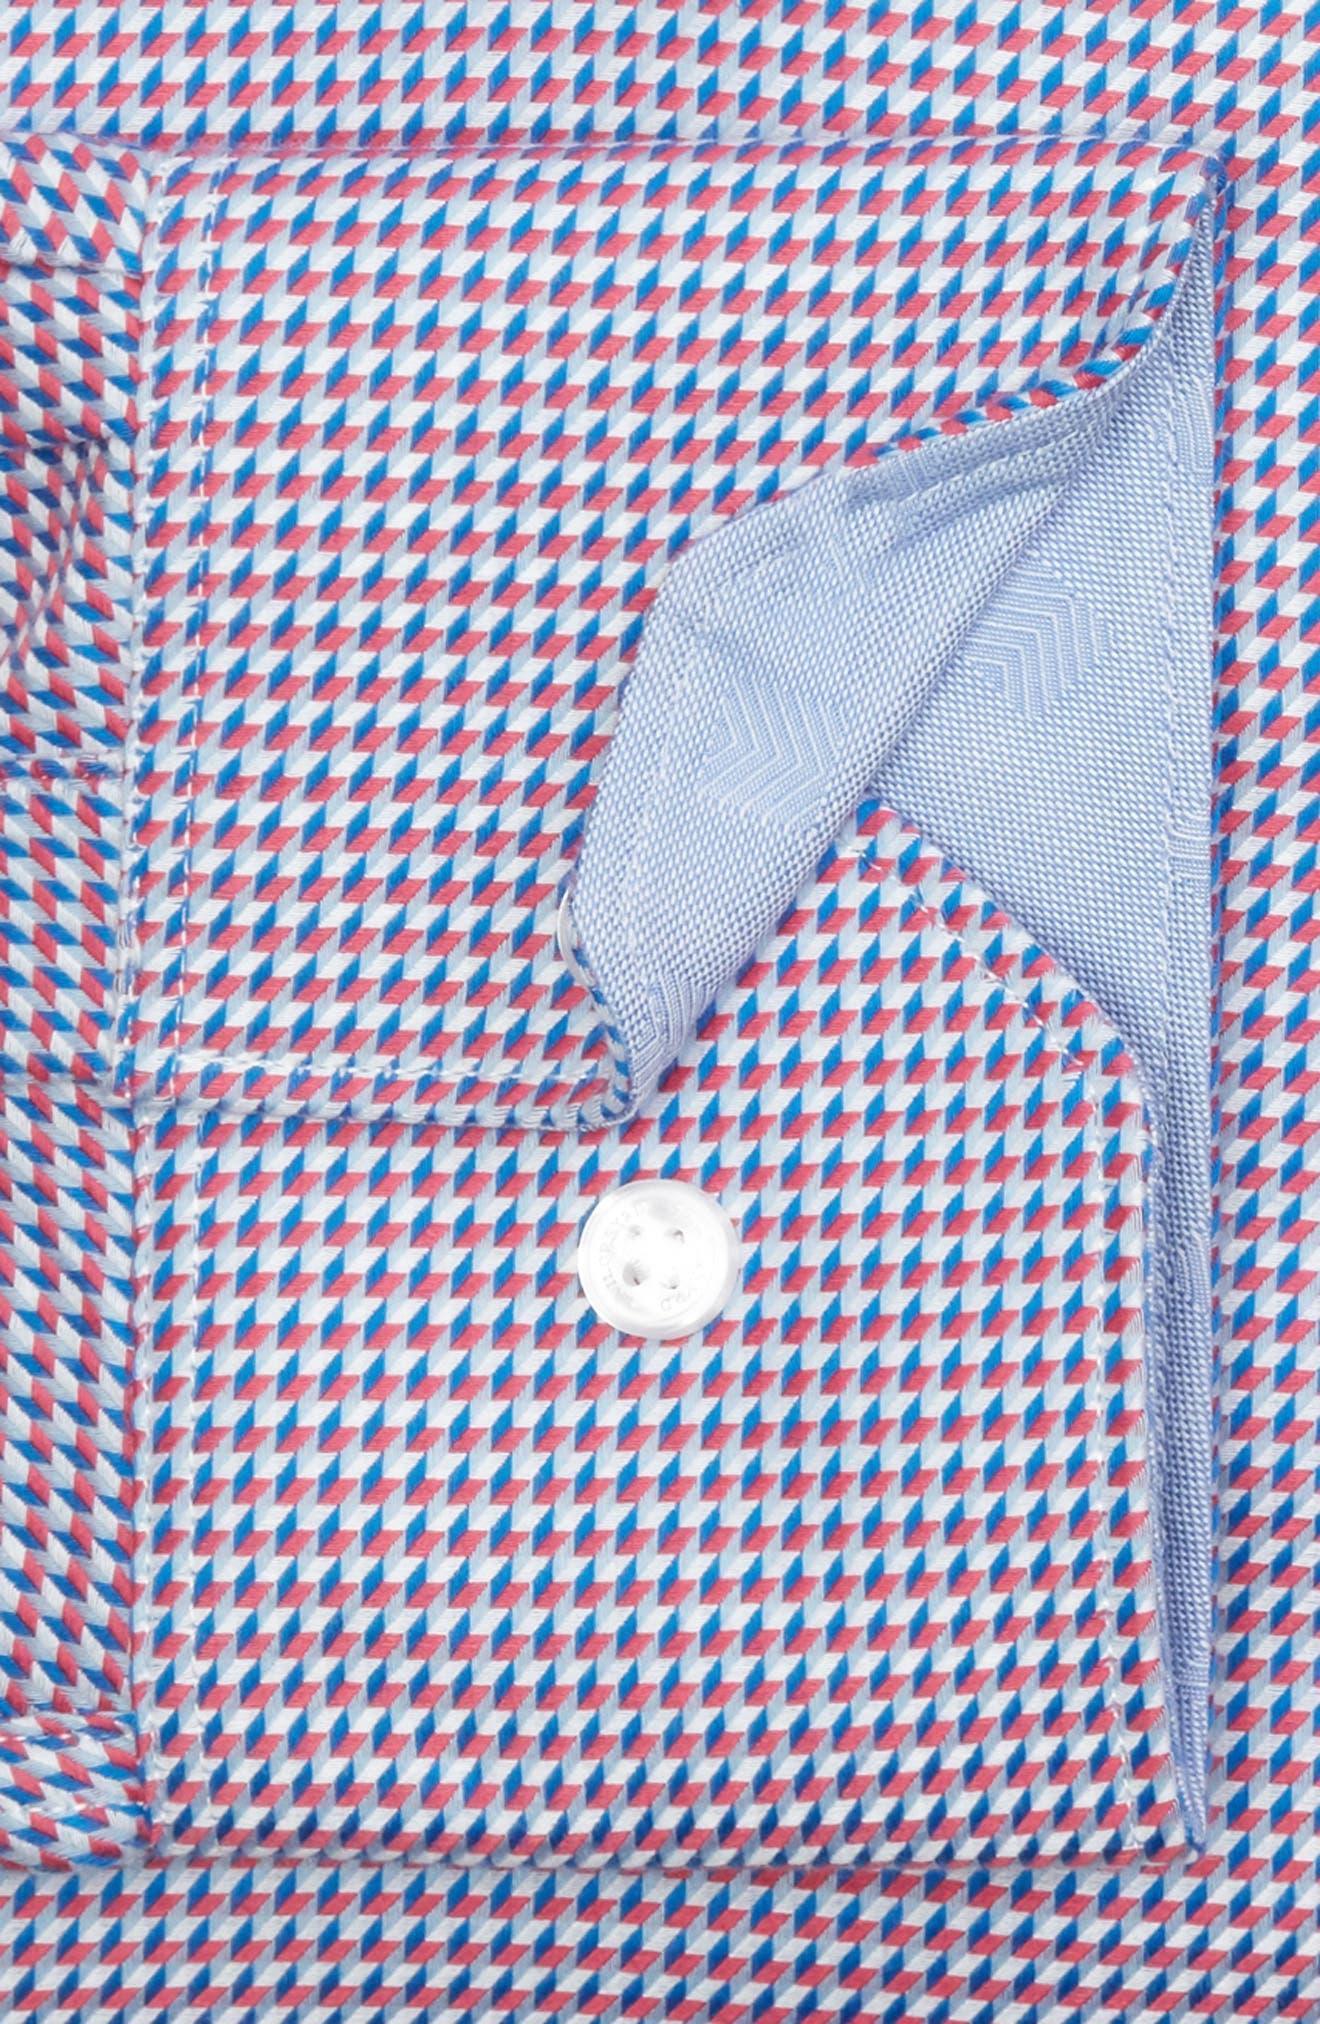 Axton Trim Fit Geometric Dress Shirt,                             Alternate thumbnail 6, color,                             400